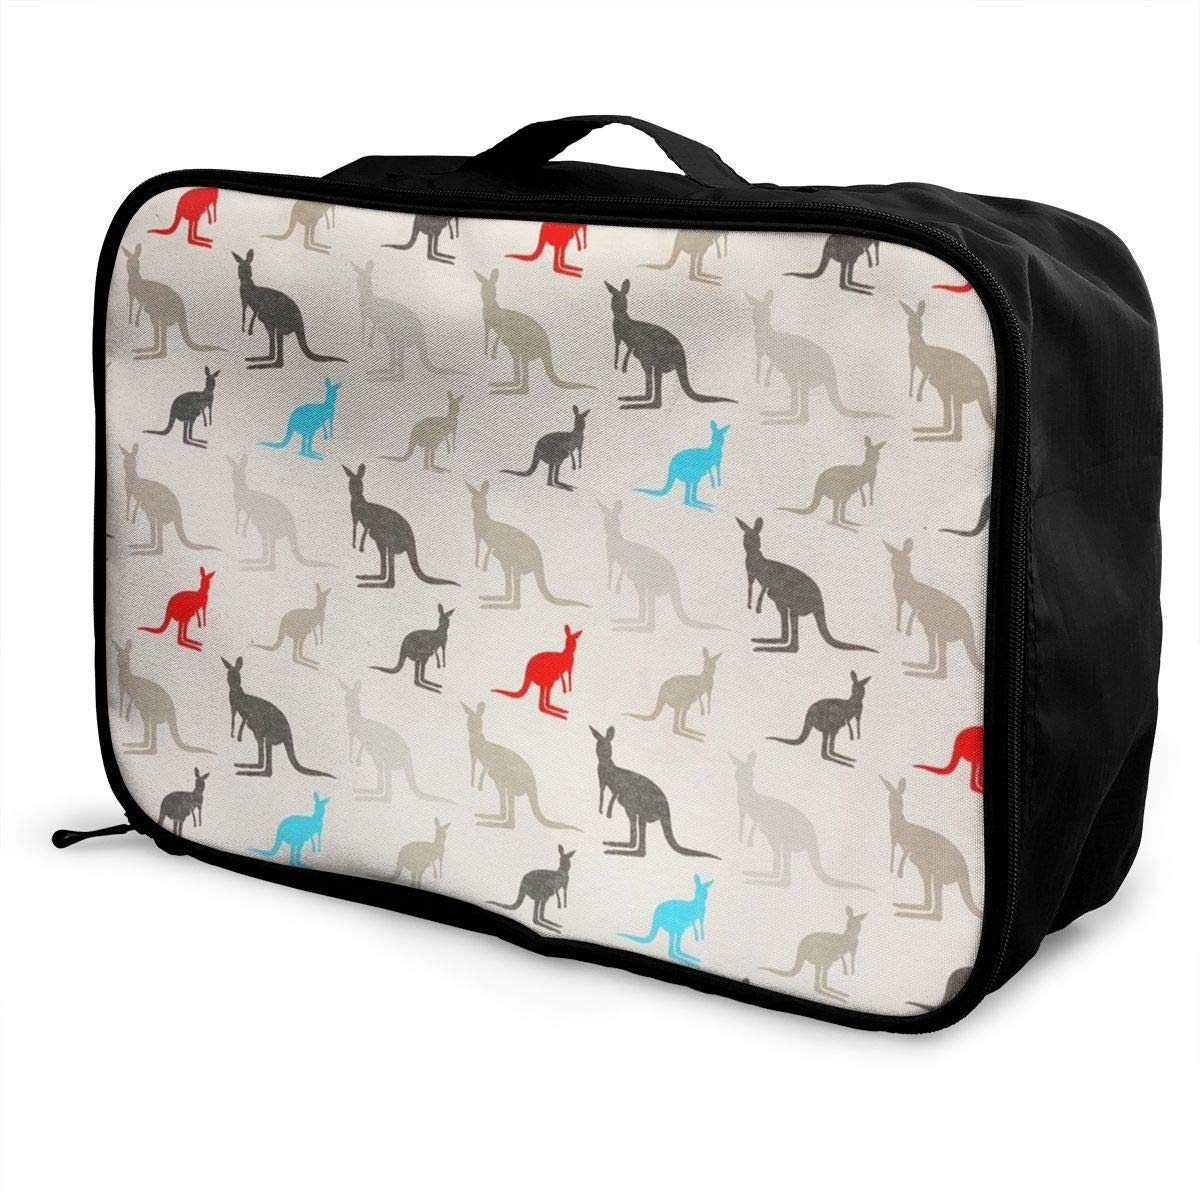 JTRVW Luggage Bags for Travel Travel Duffel Bag Waterproof Fashion Lightweight Large Capacity Portable Duffel Bag for Men /& Women Australia Kangaroos